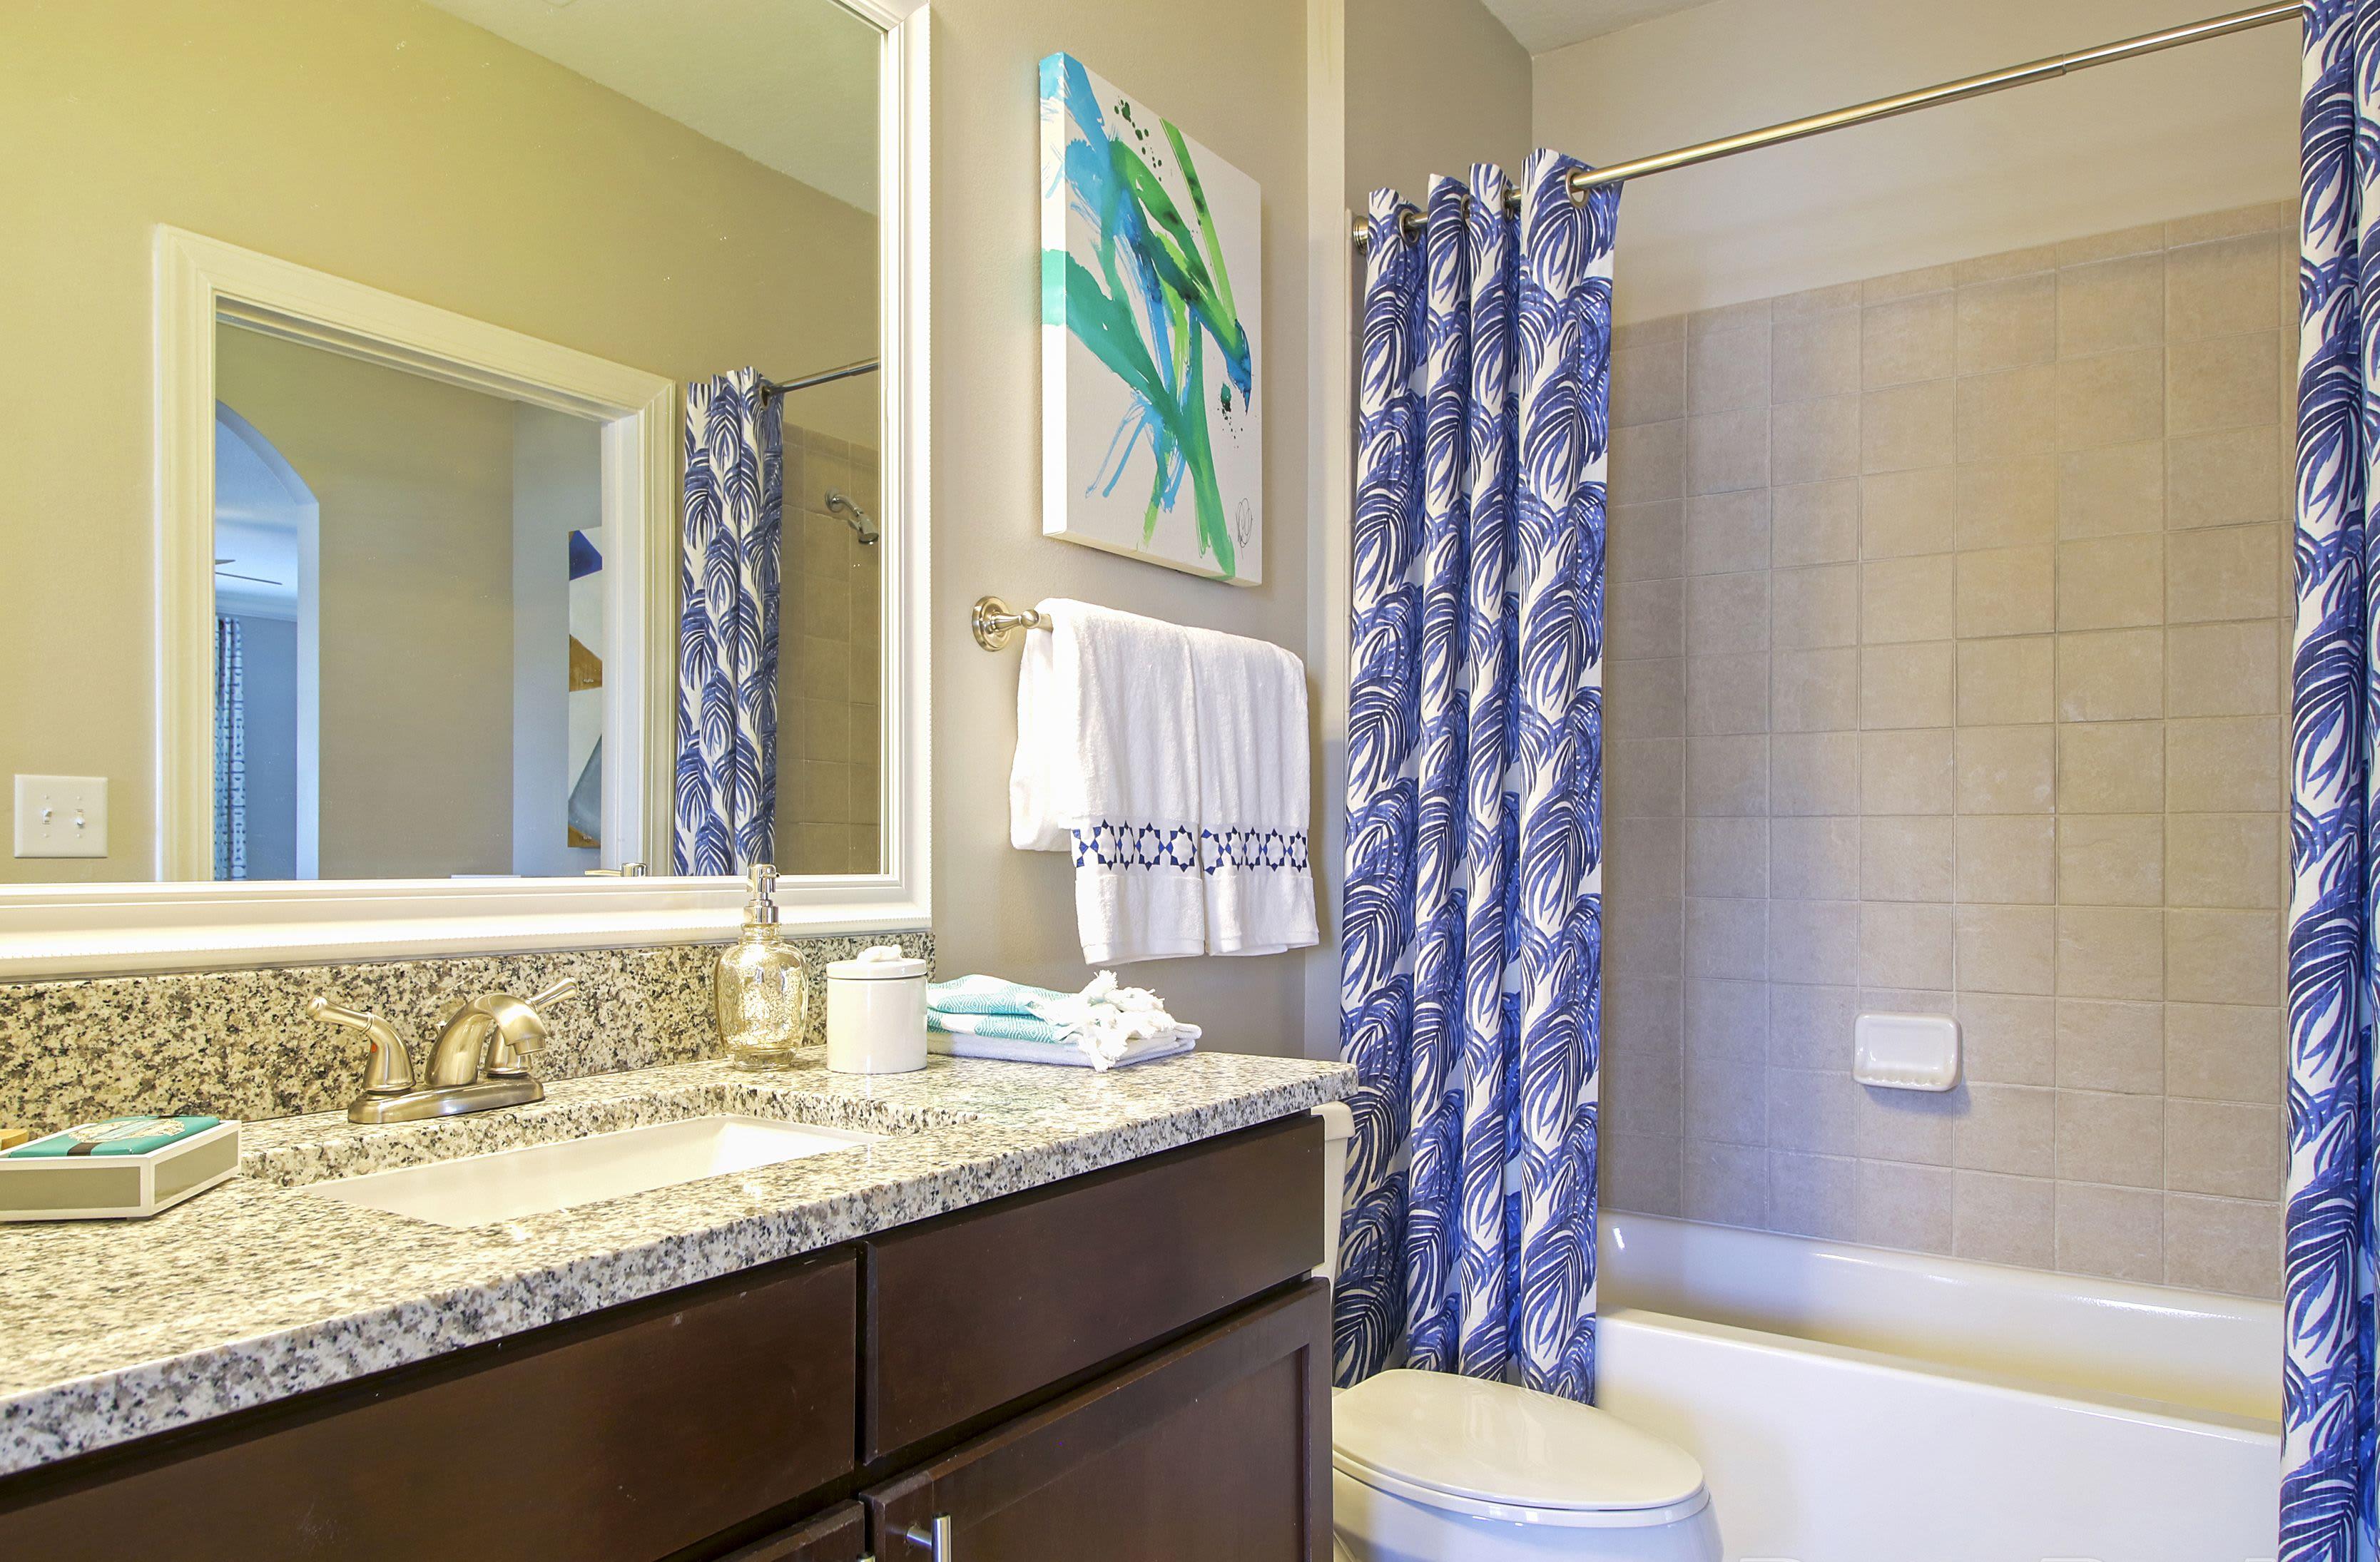 Luxury Bathroom at Highlands Viera West in Melbourne, Florida